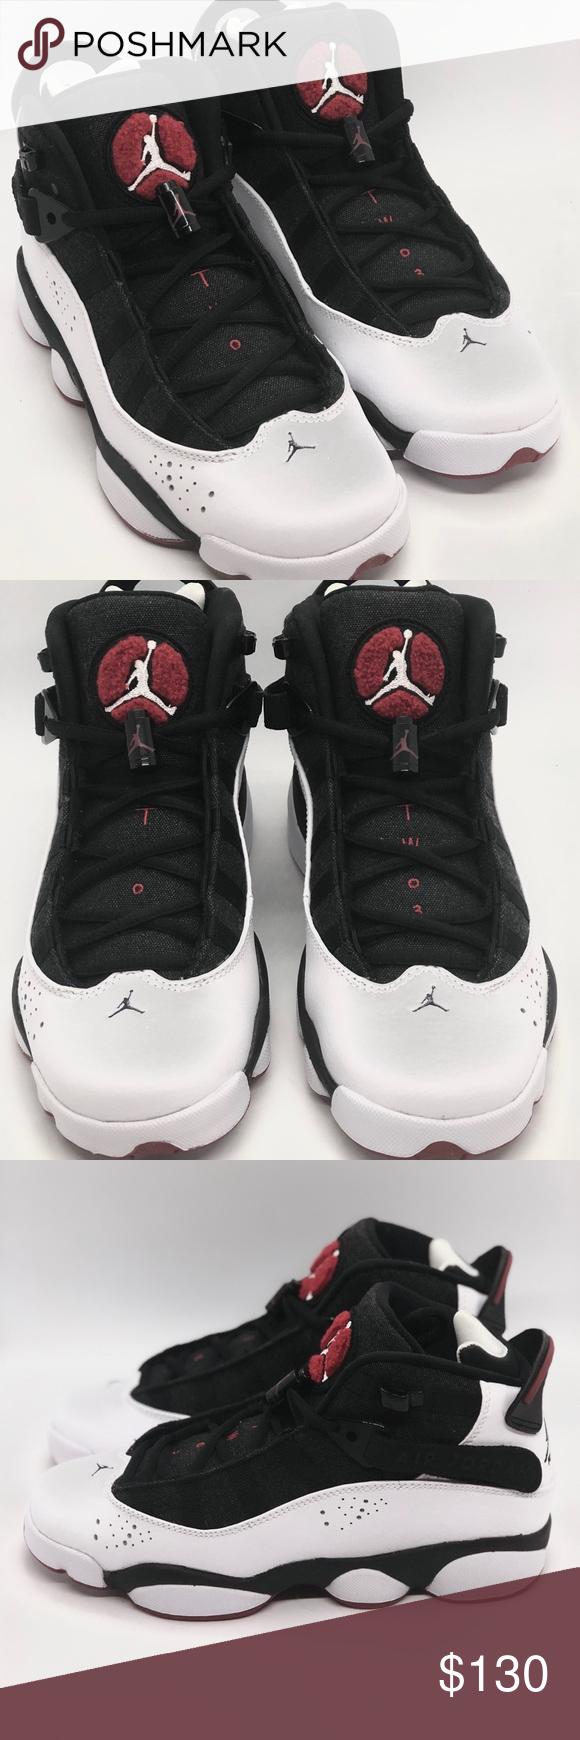 51bf1bffa46e NIKE 🏀 Jordan 6 Rings BG (323419 012) Youth Size ⚠ Perfect staple